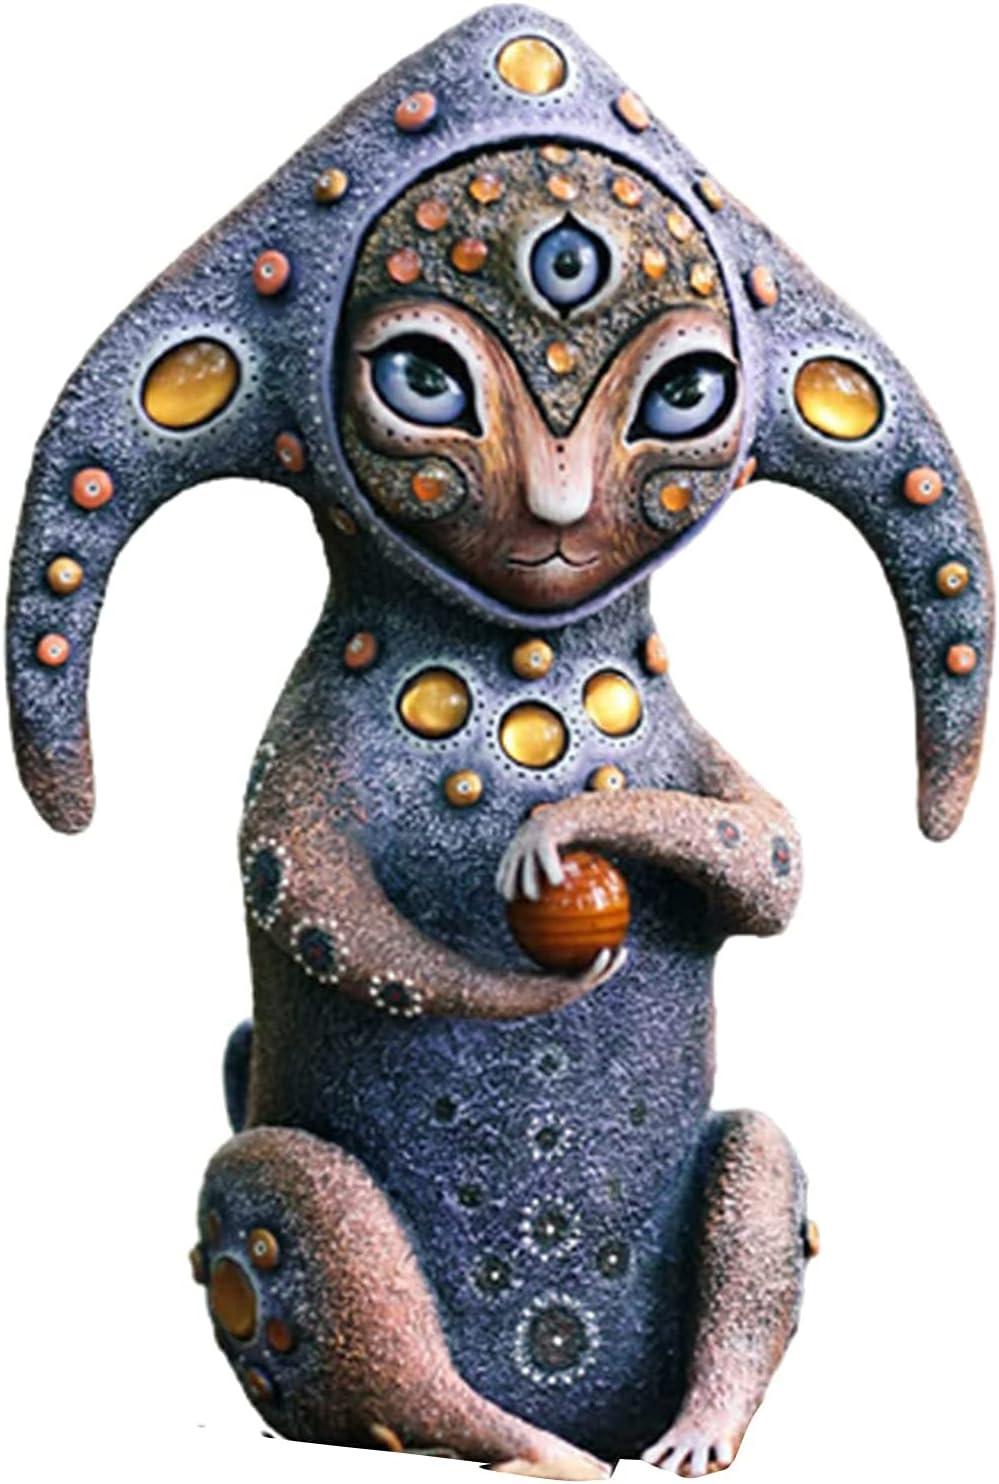 HHJY Creatures from a Fantasy World-Perfect Decoration, Incredible Creatures Toys - Boy Garden Toys, Fantastic Alien Creature Outdoor Statues, Handmade Animals Garden Decor (Planet Guardian)